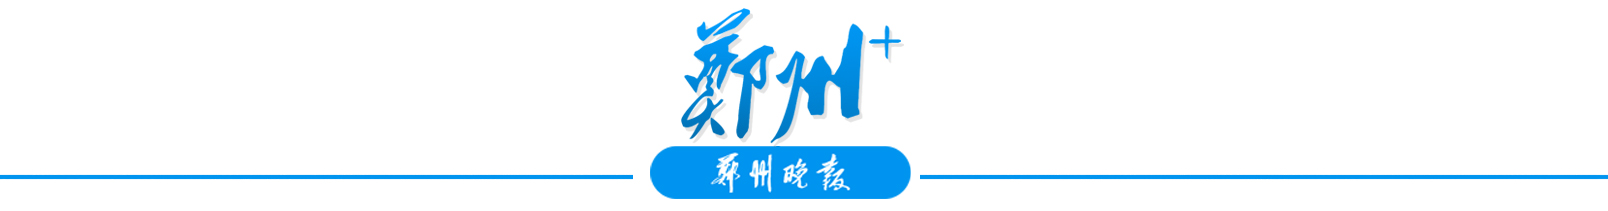 郑州.png